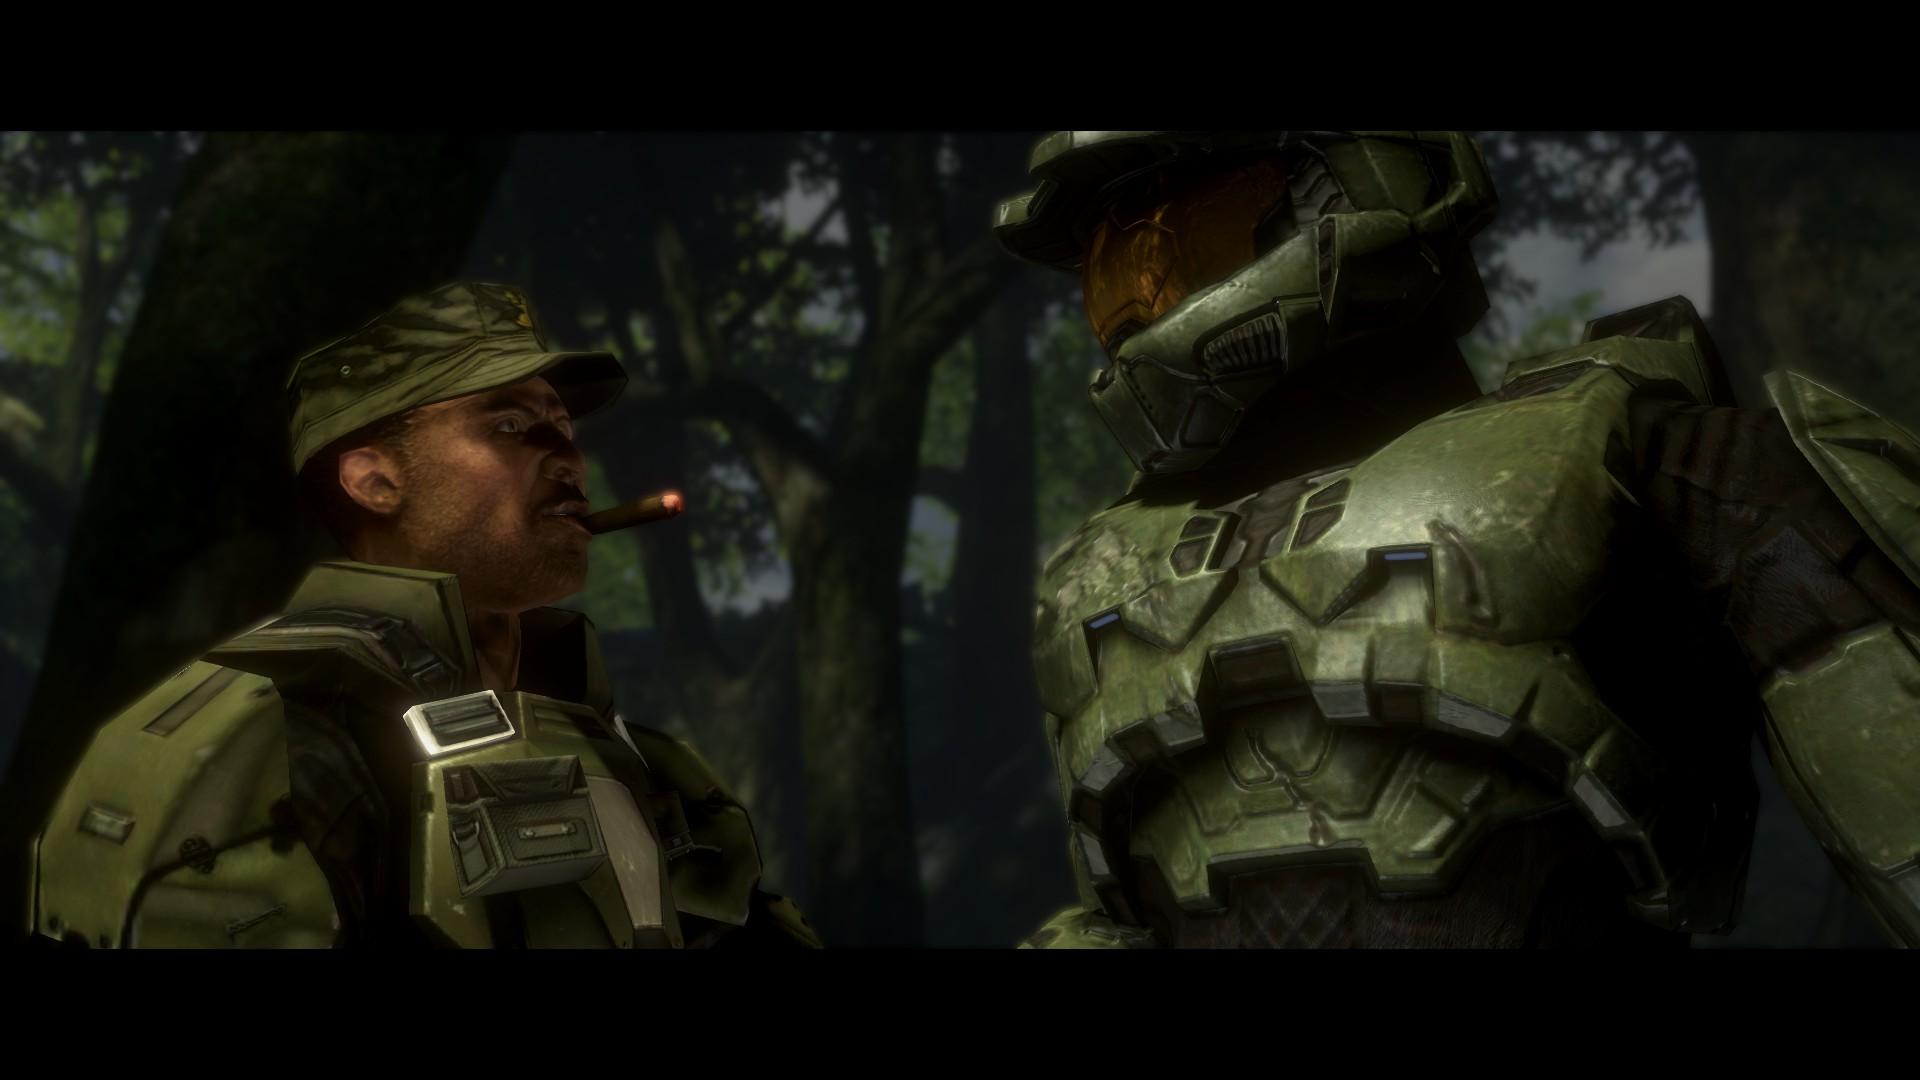 Halo 3 DLC Master Cheif Collection 8Bit/Digi